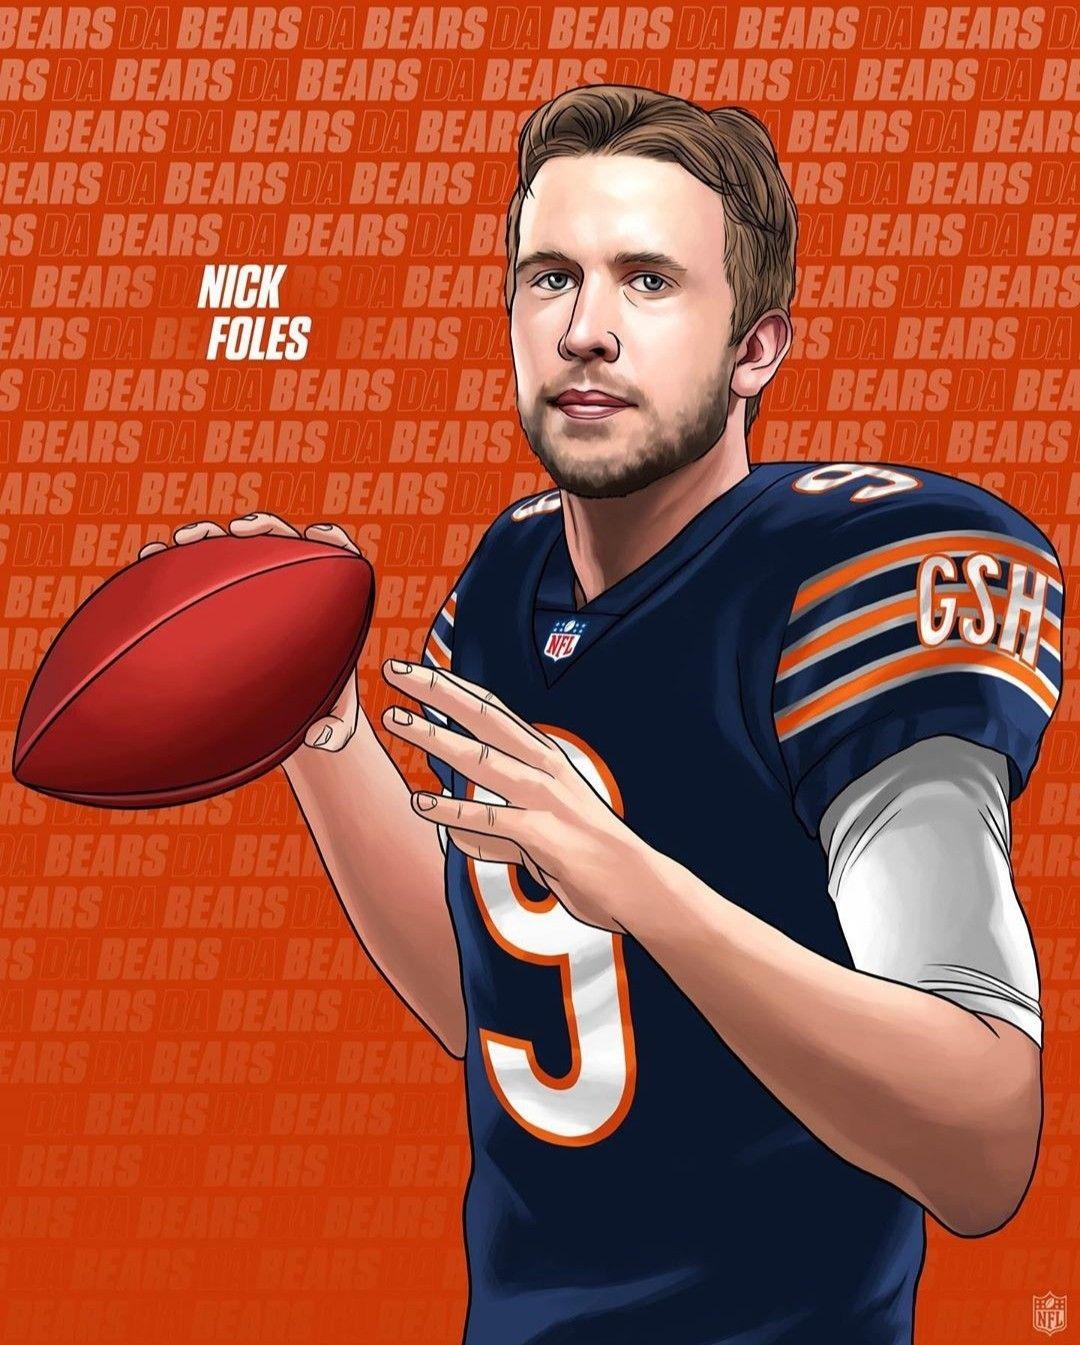 Nick Foles To Bears In 2020 Nfl Nfl Football Wallpaper Nfl Football Art